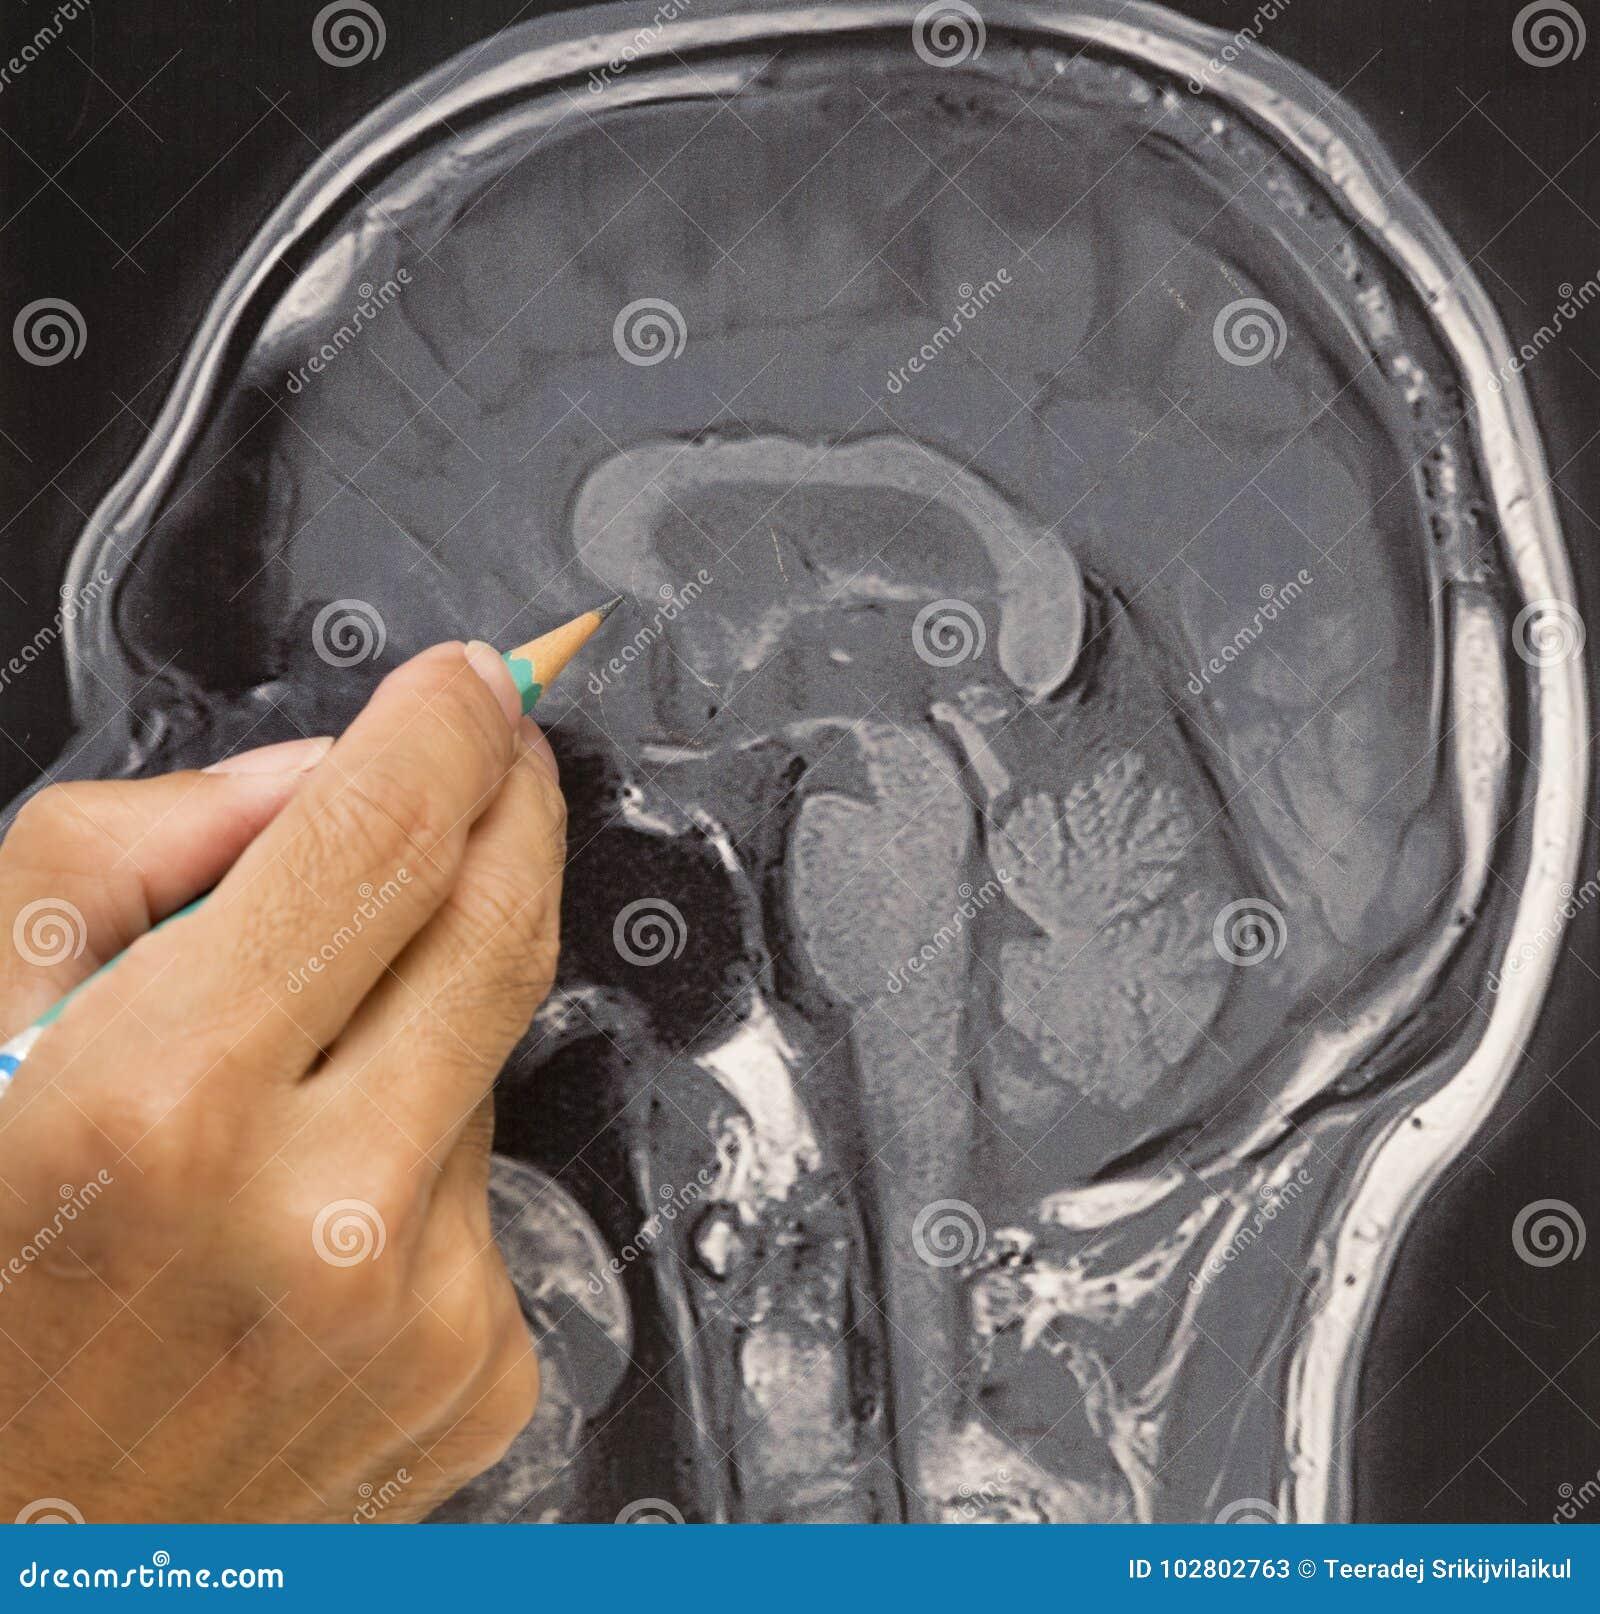 Mri Brain Picture And Doctors Hand Stock Image Image Of Resonance